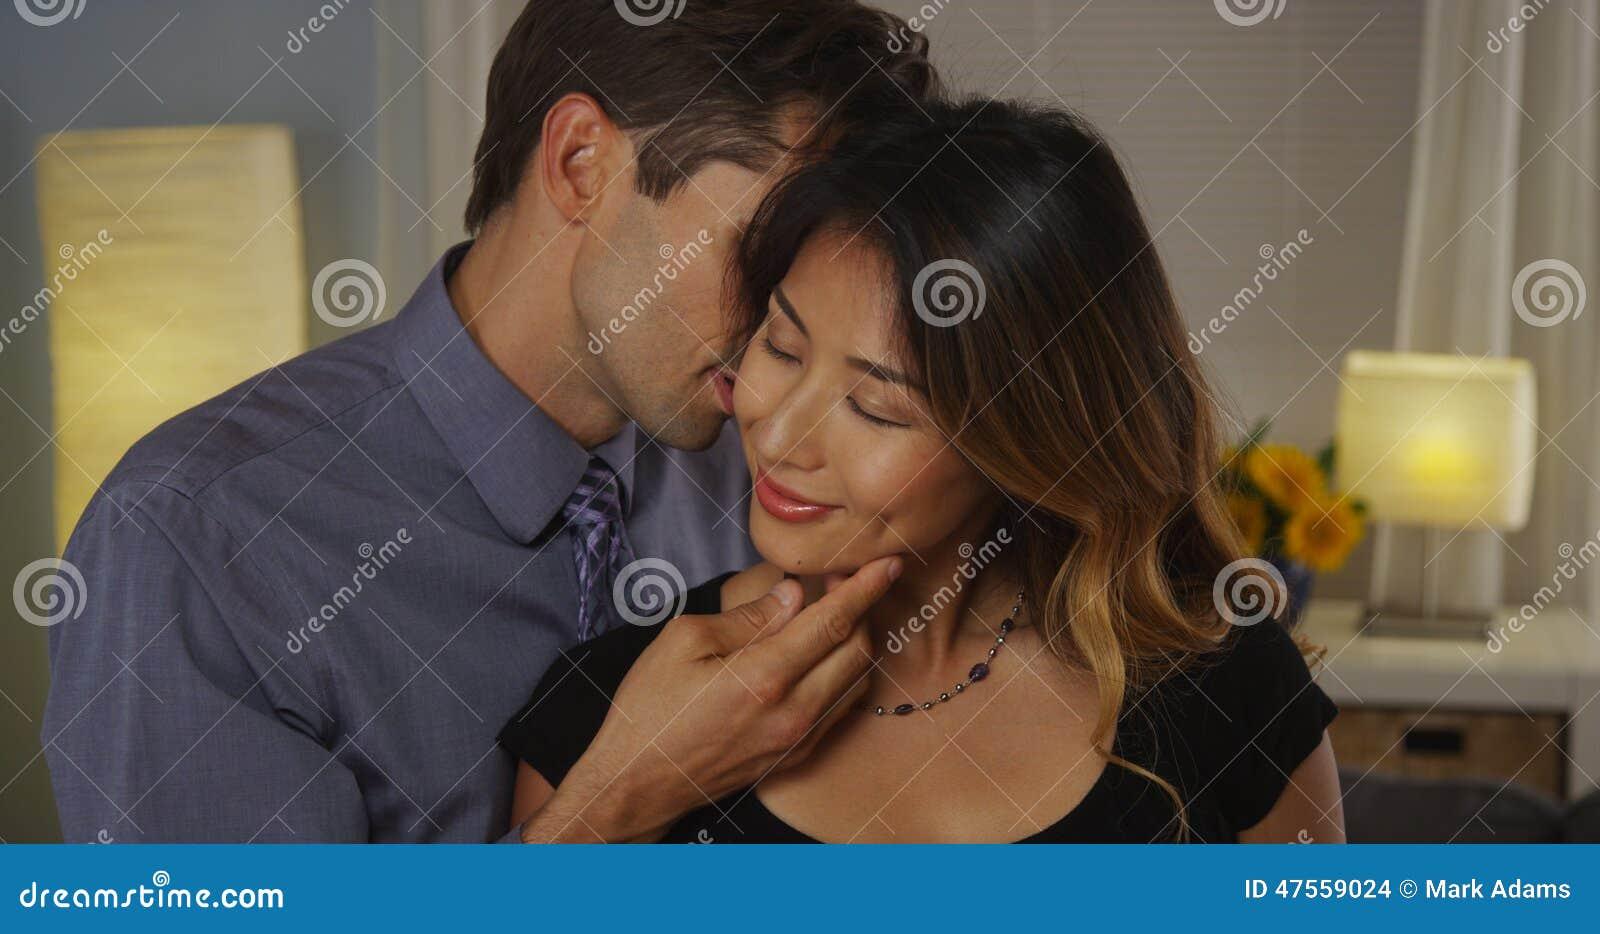 Intimate Interracial 106